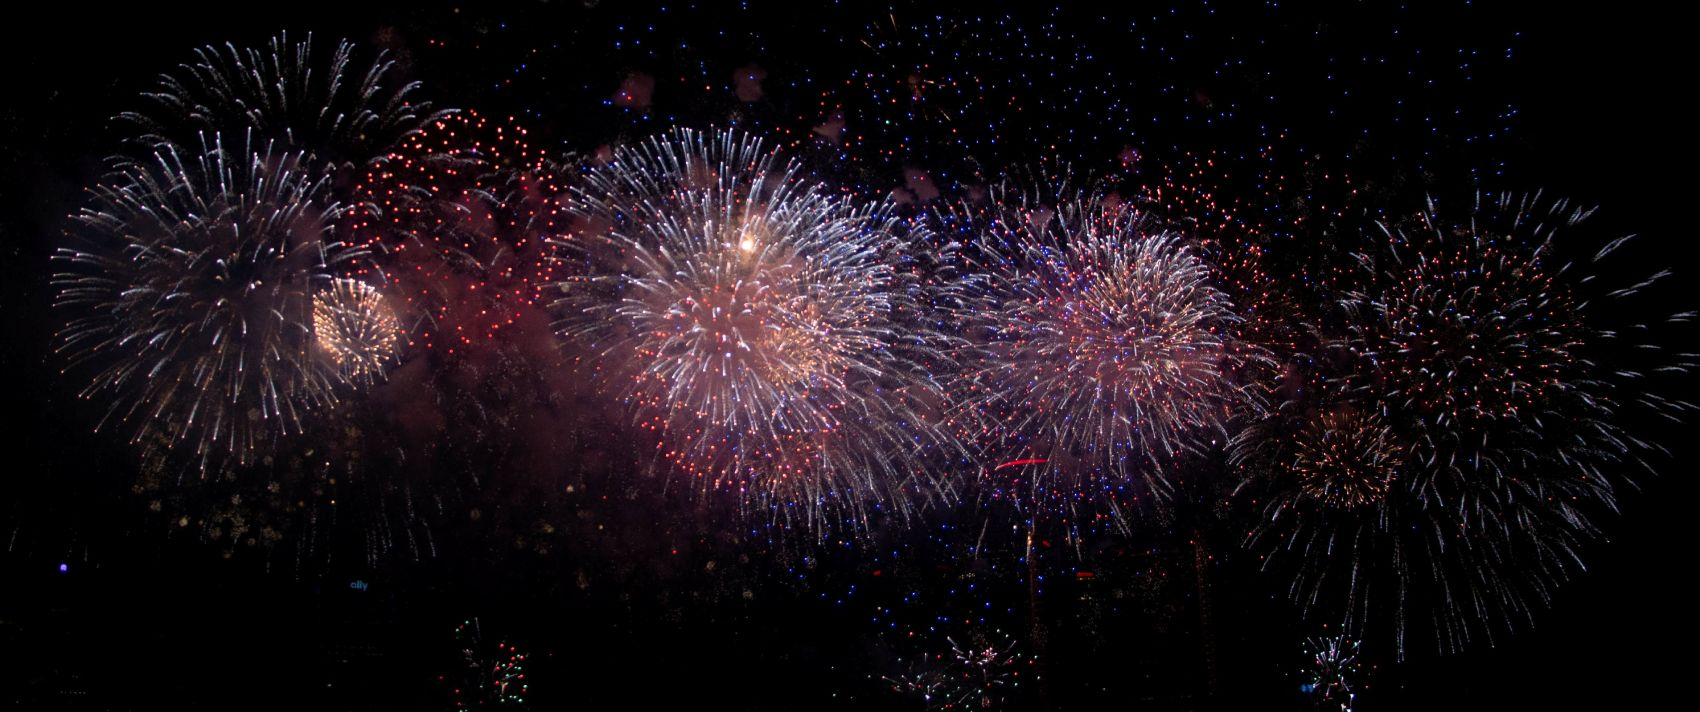 fireworks banner - trust-tru-katsande-718752-unsplash.jpg